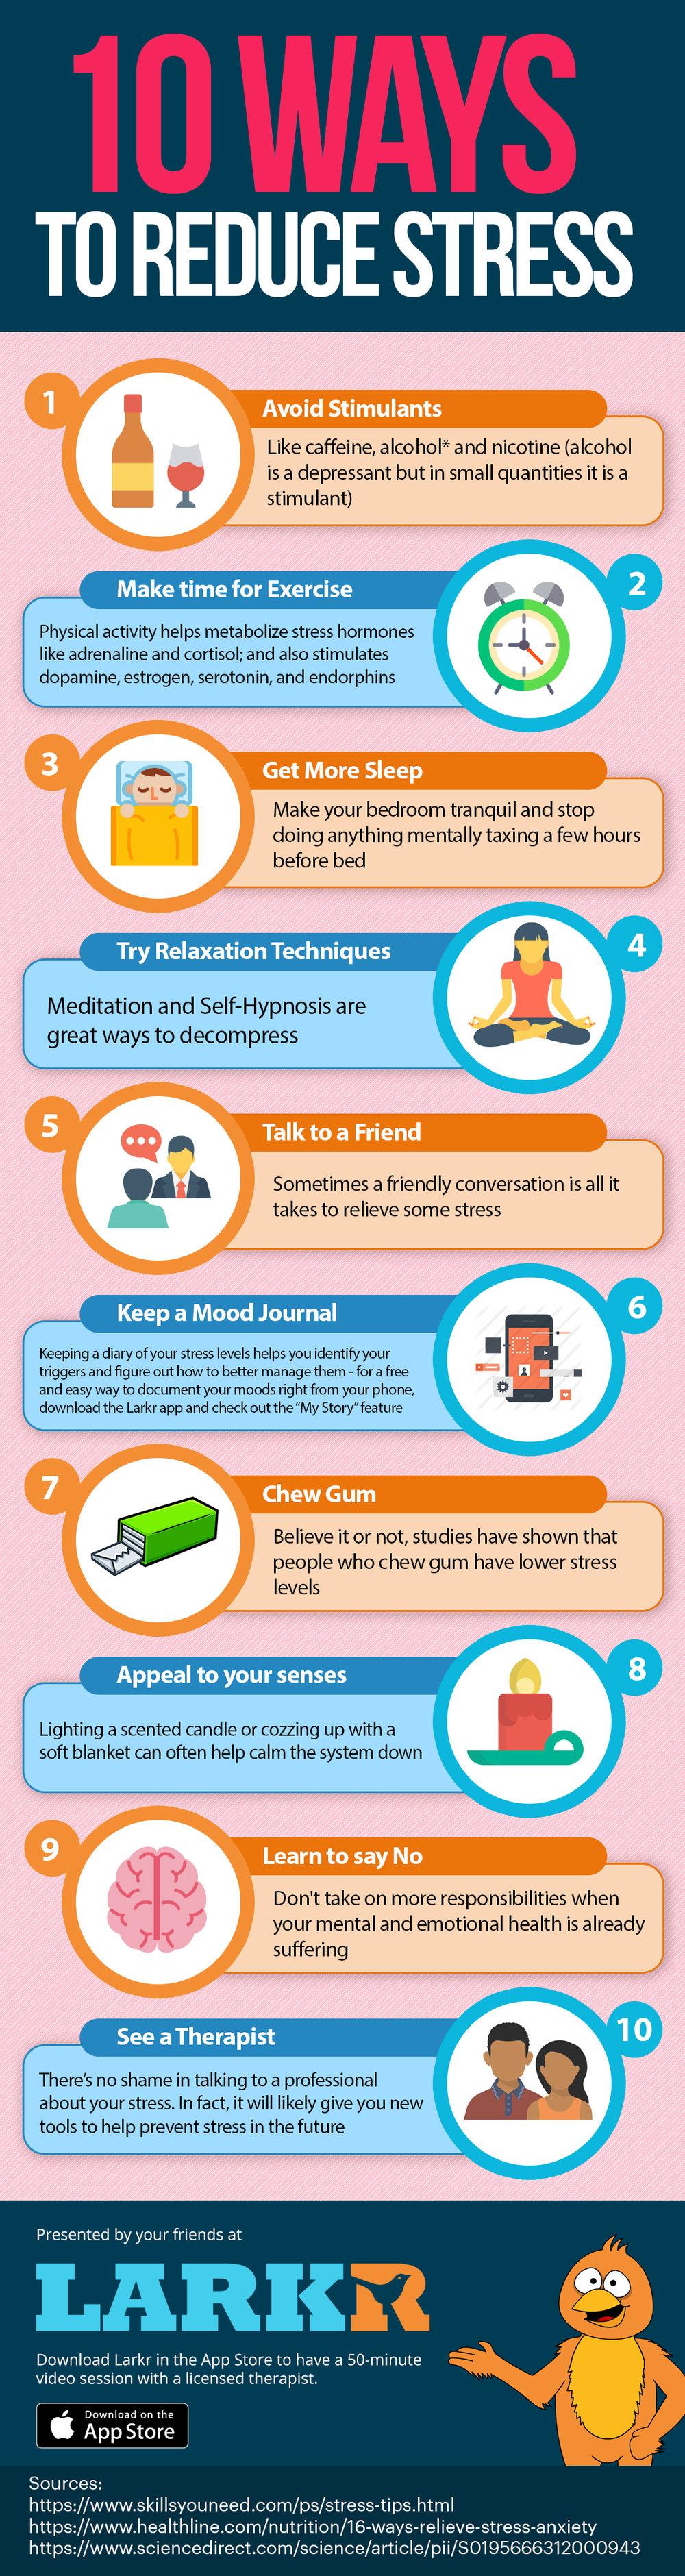 10-ways-stress-reduction.jpg